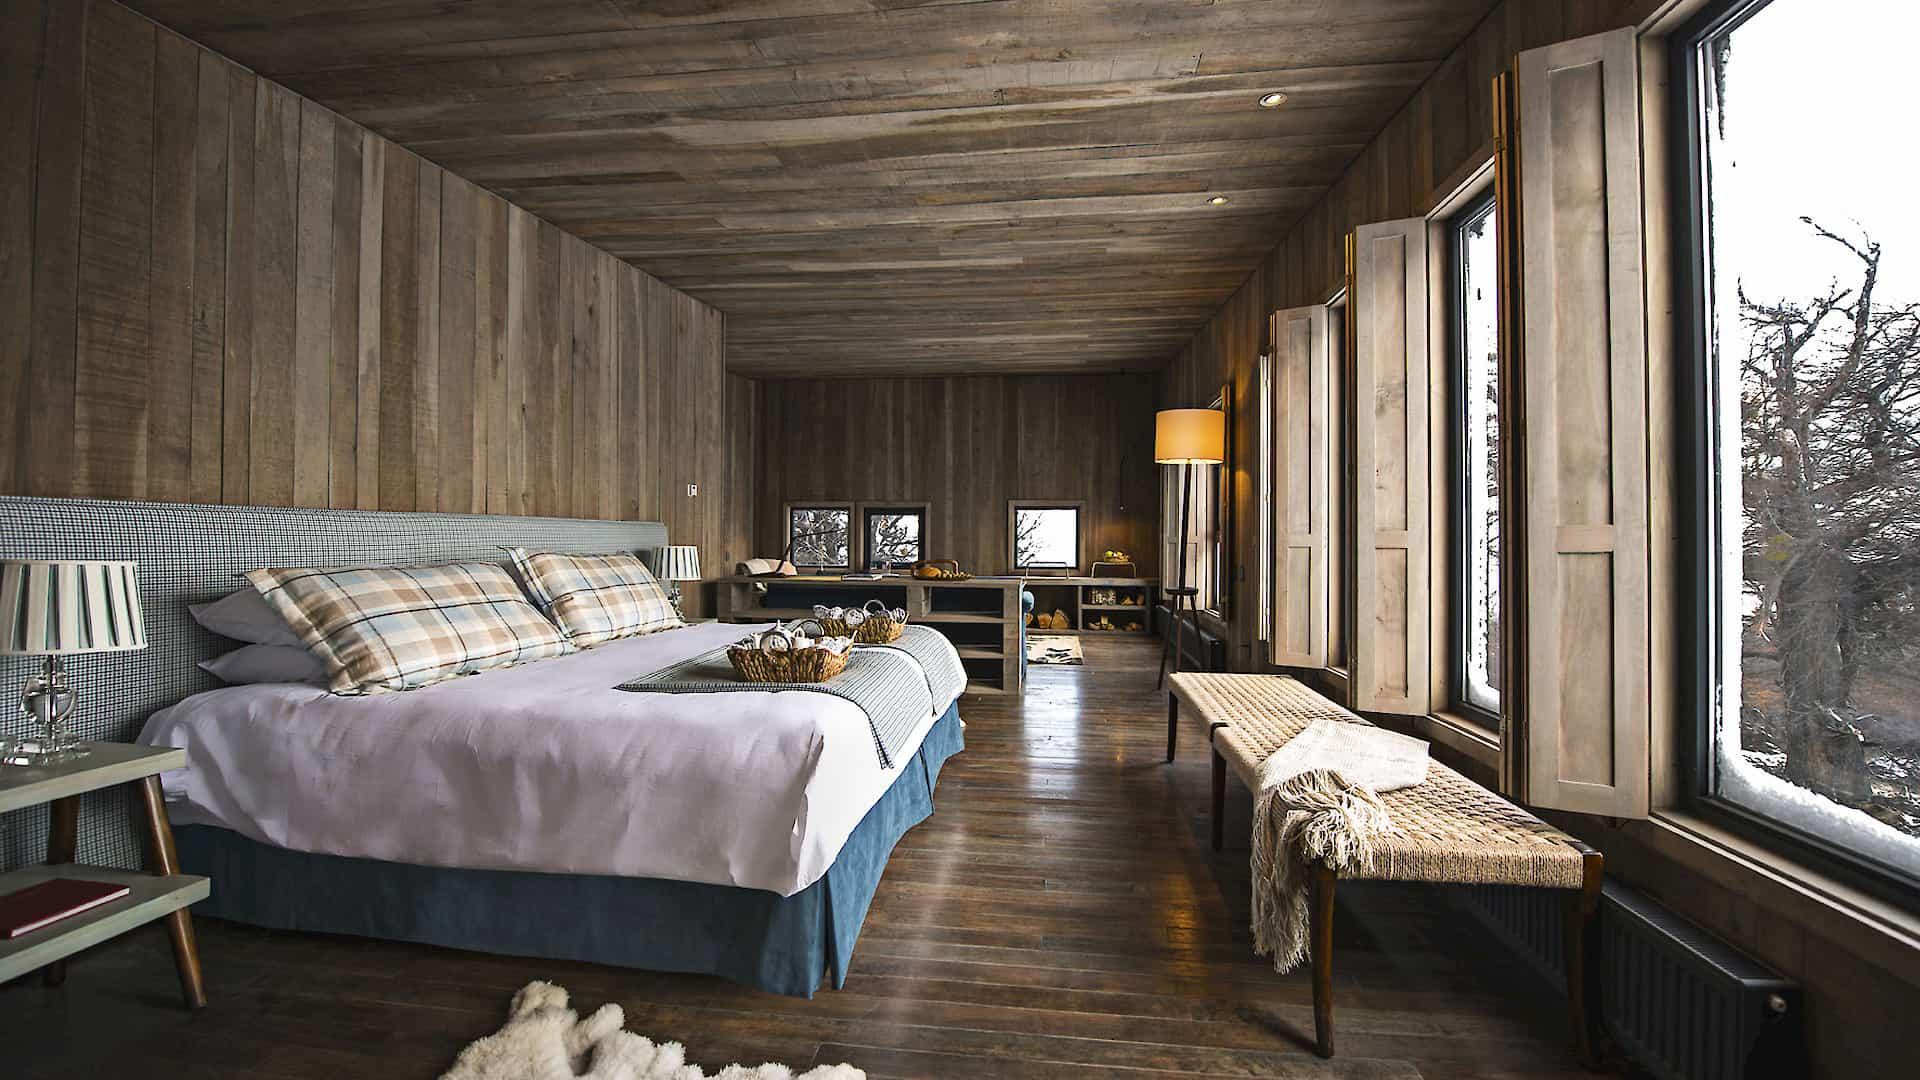 Awasi-Patagonia-Resort-viaggio-di-nozze-Cile-4